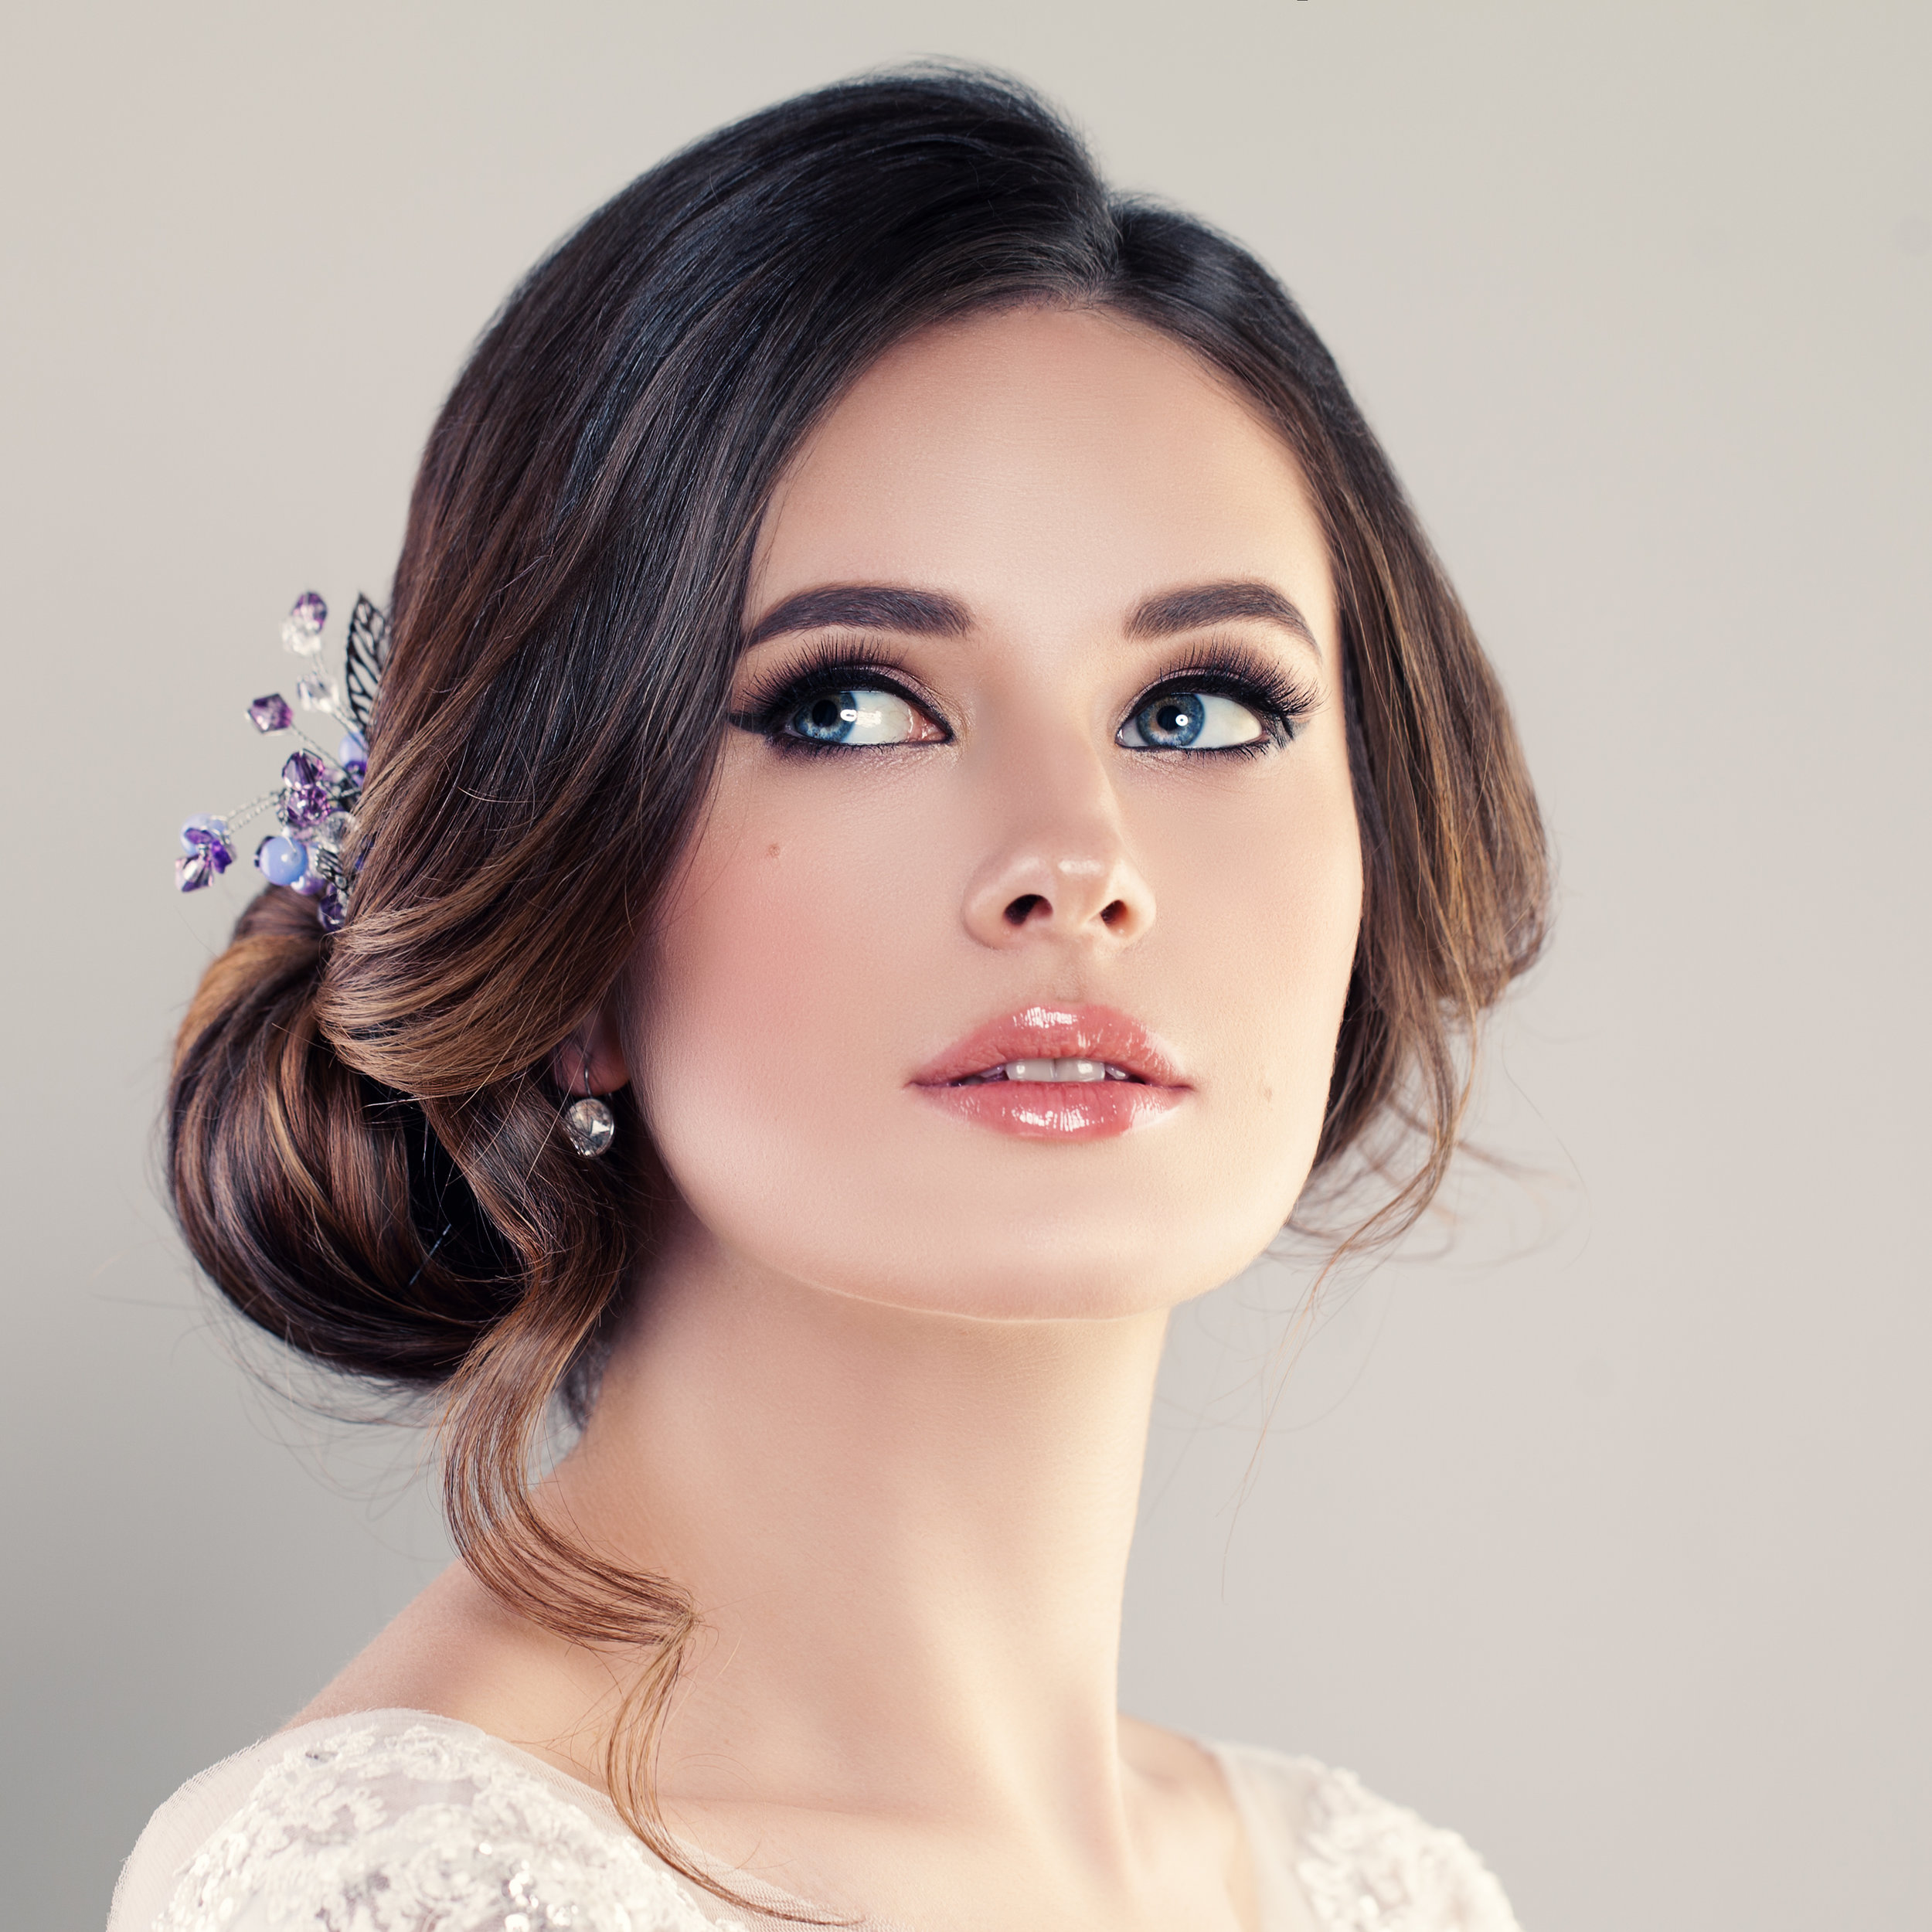 Bliss Bridal Makeup - creating flawless wedding day makeup